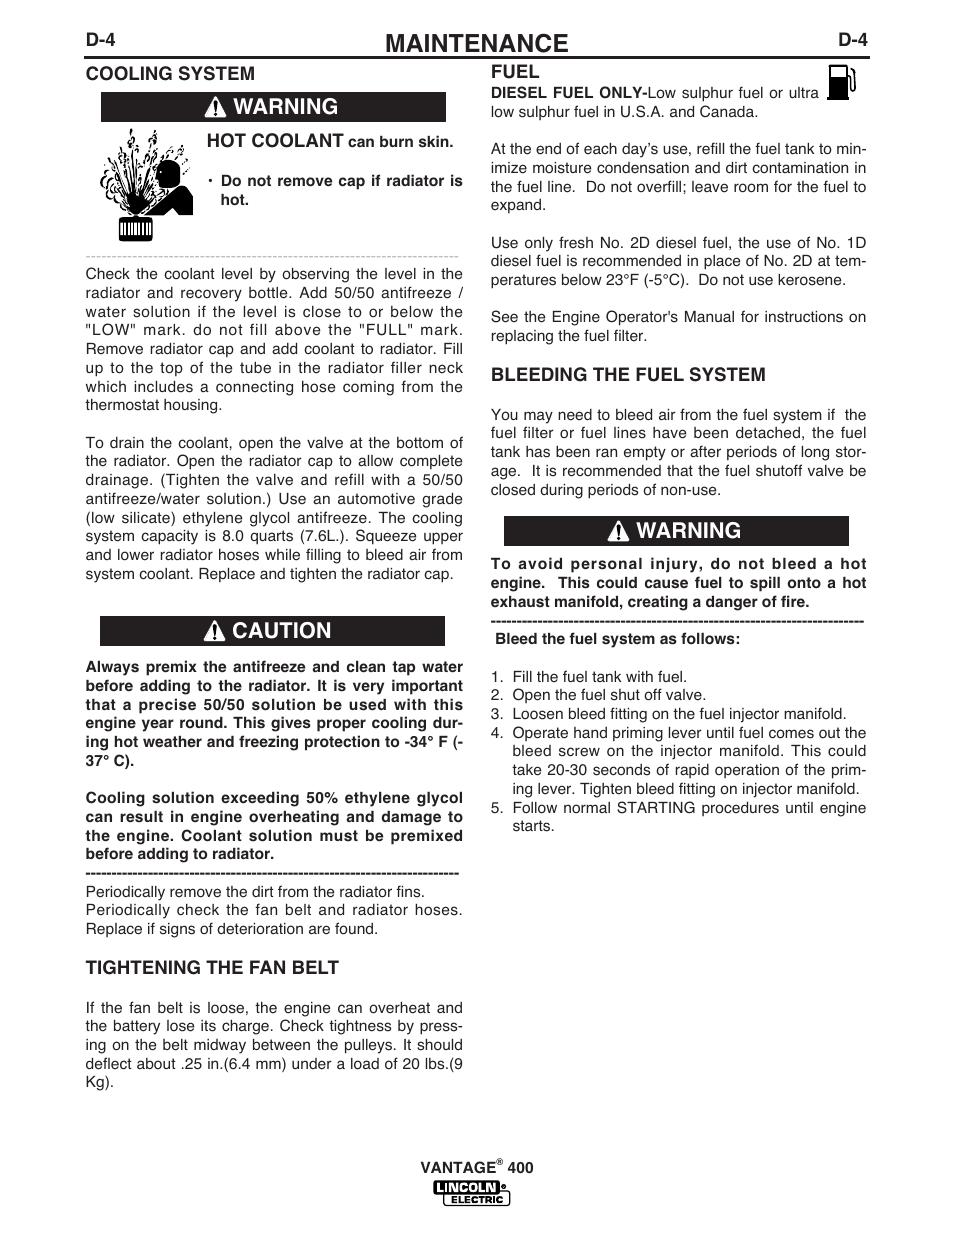 Maintenance, Warning caution warning | Lincoln Electric